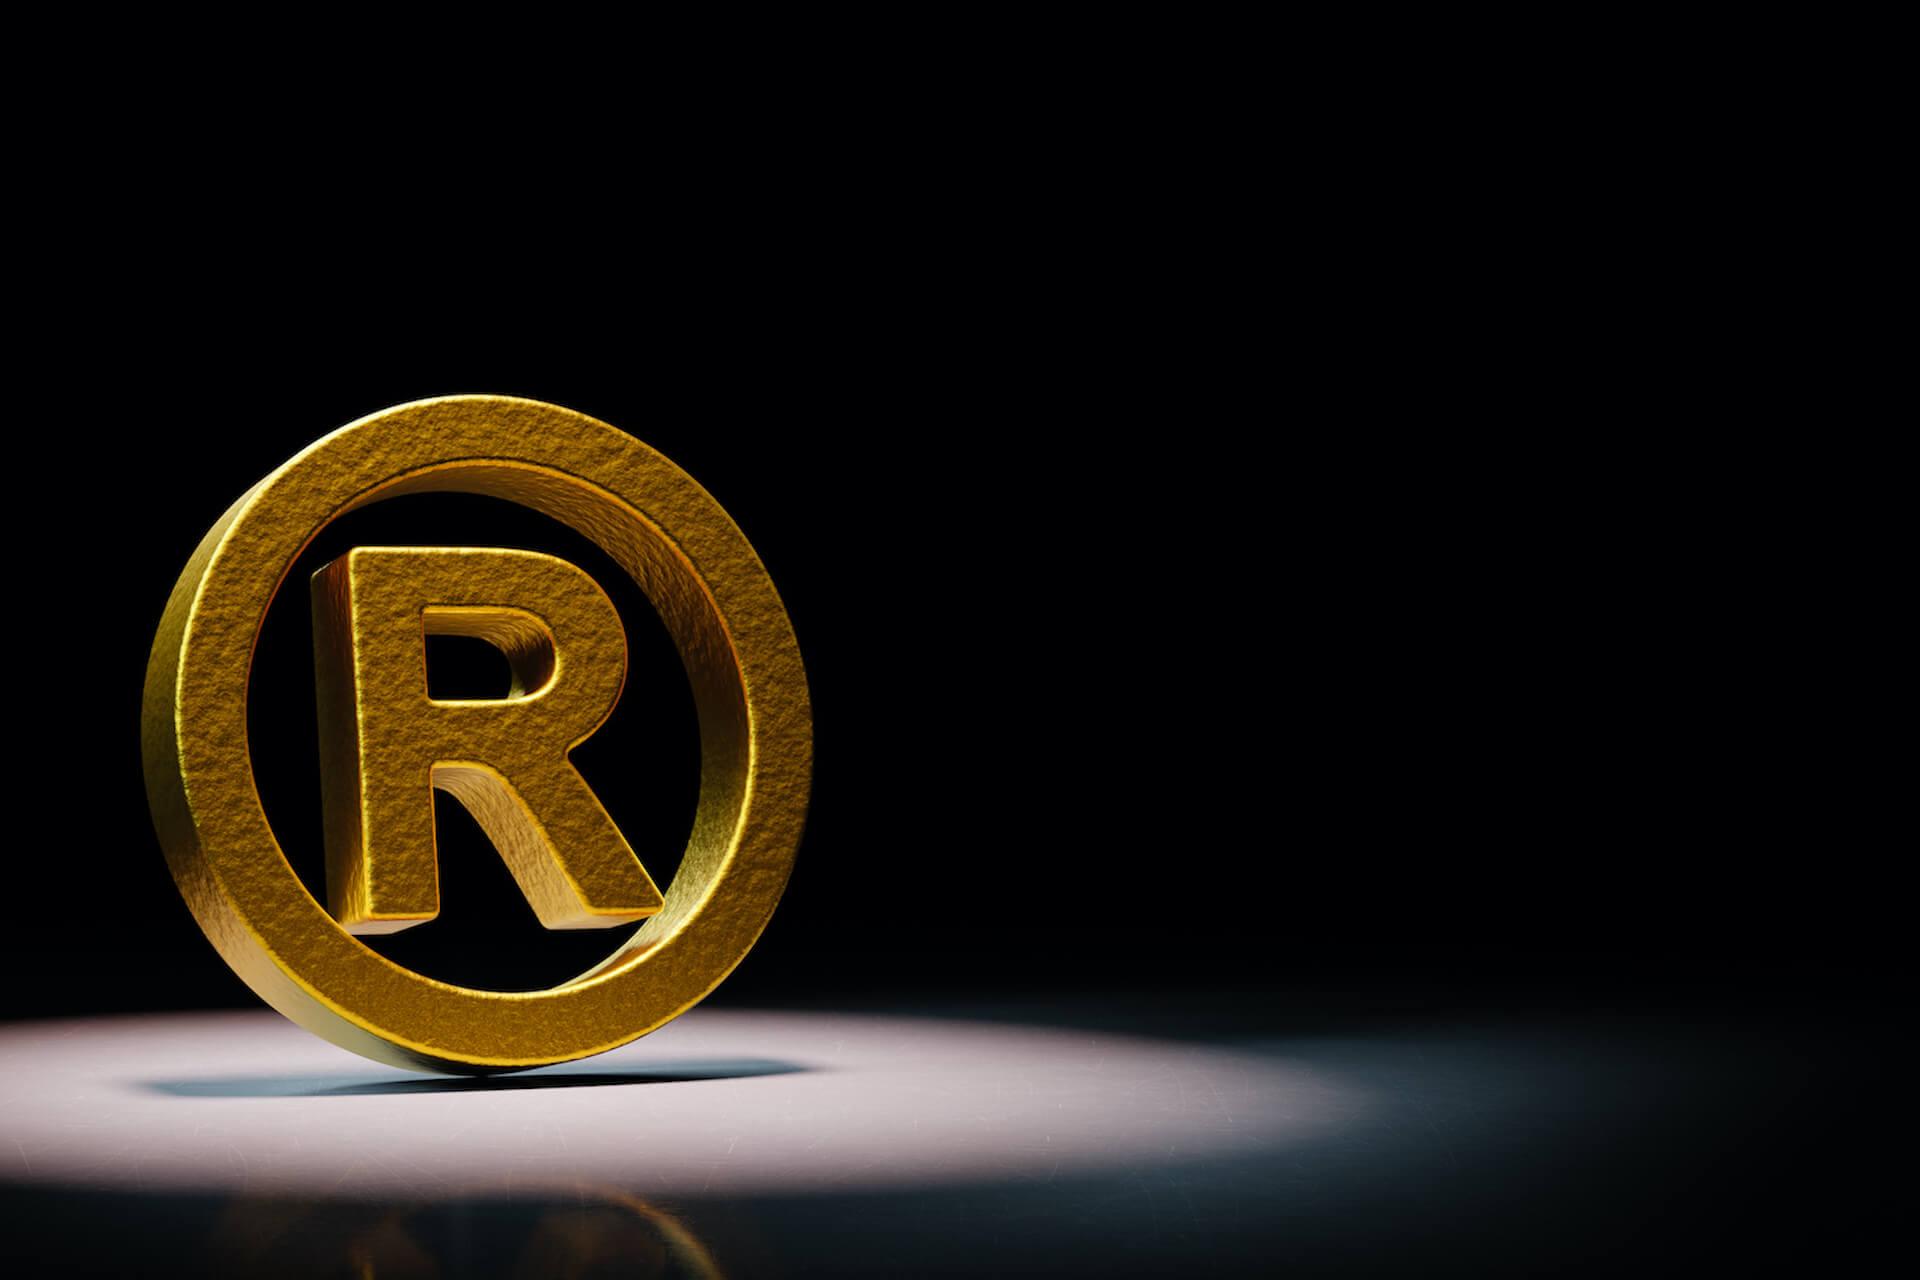 golden-trademark-symbol-spotlighted-black-background(2)